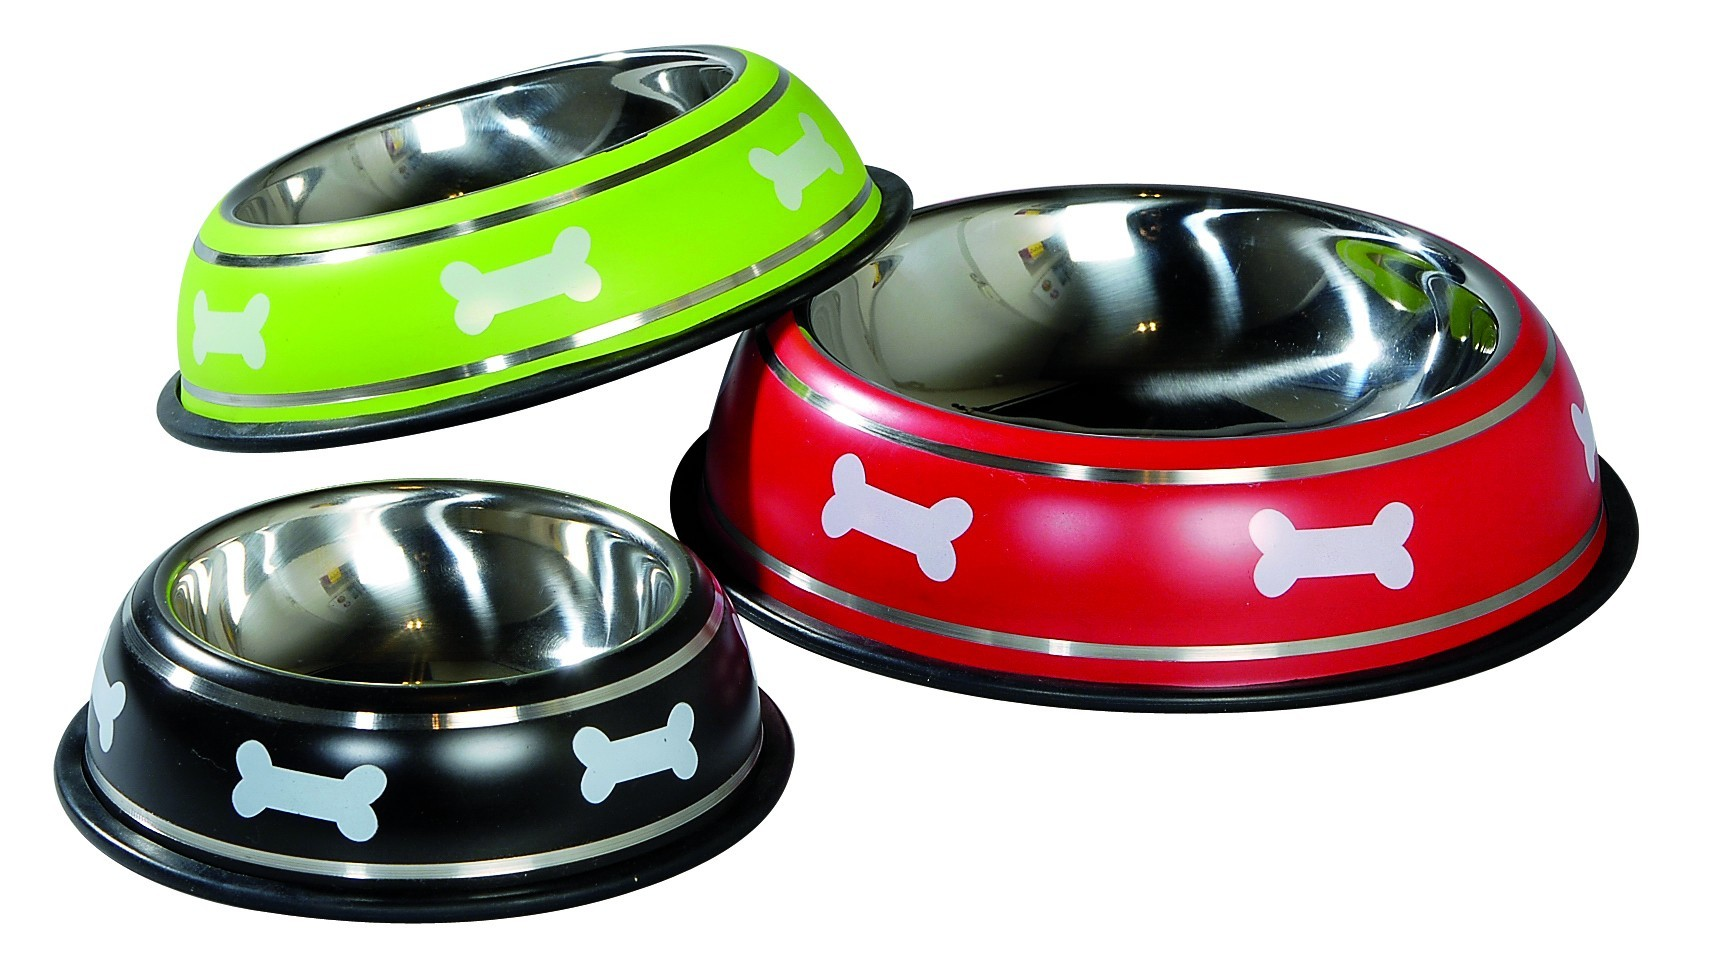 Gamelle pour chien inox Manege, Couleur: Rouge, Taille: 30